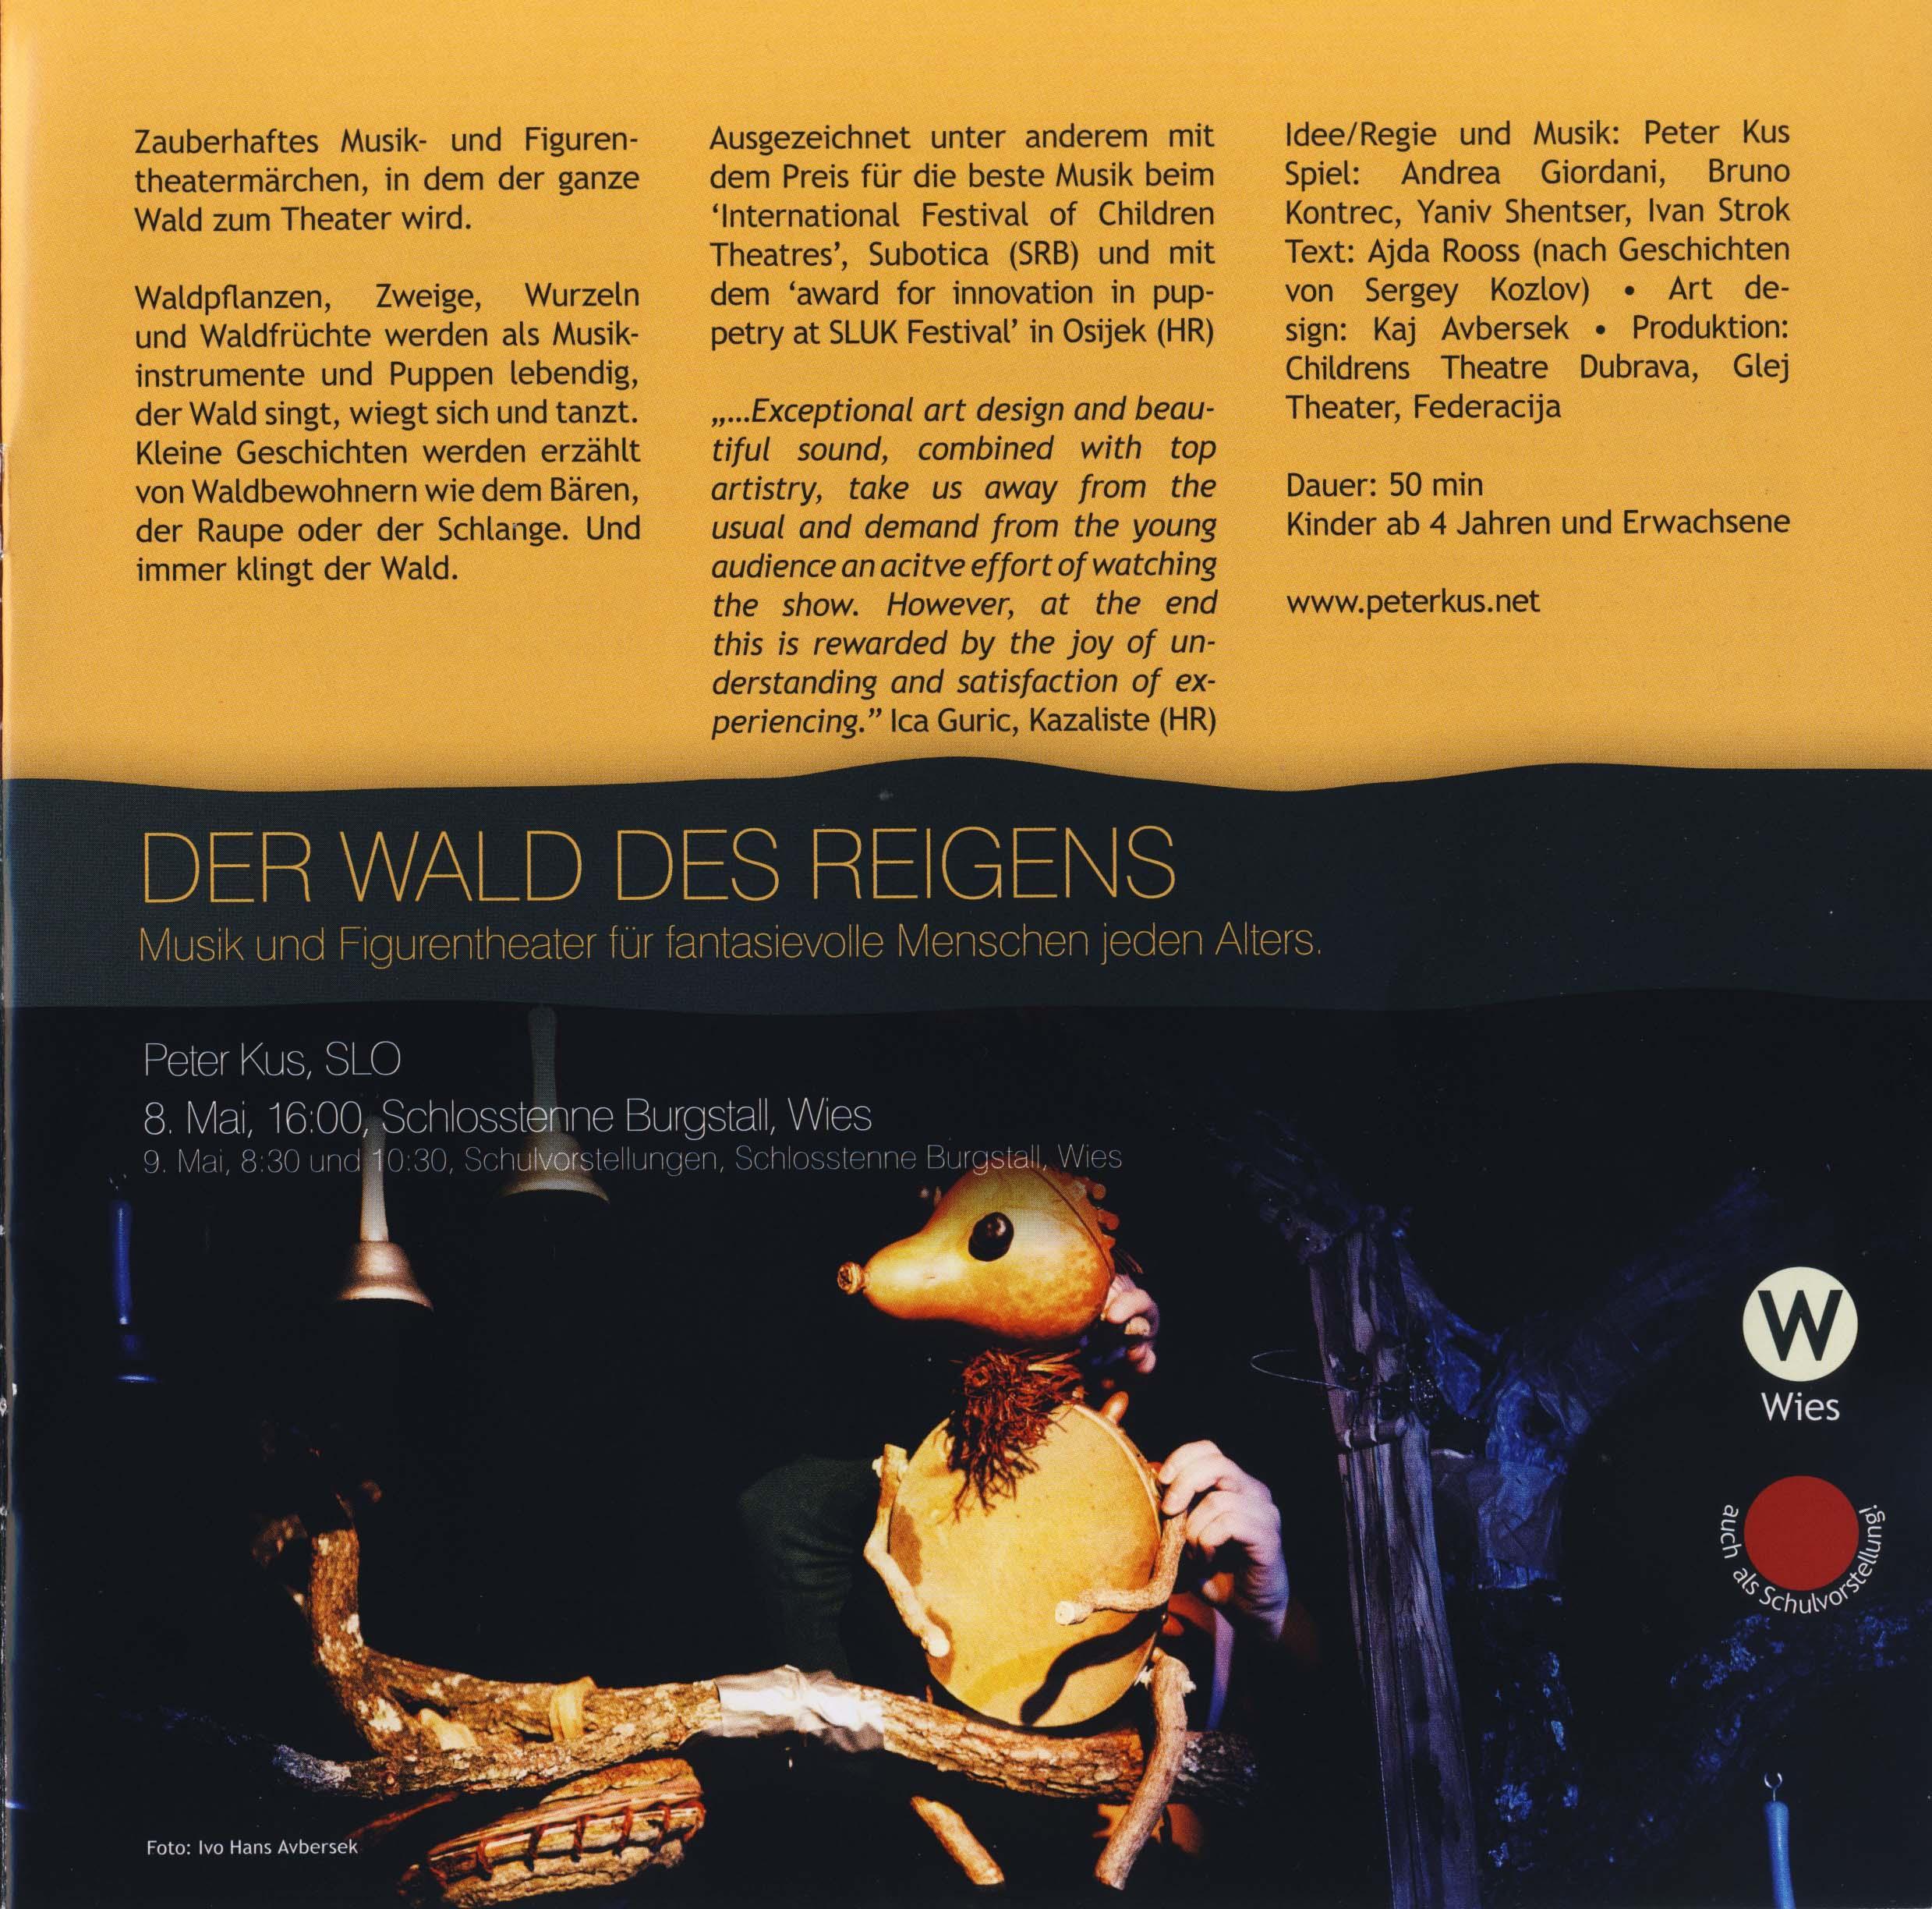 Wald_des_Reigens_Wies_sml